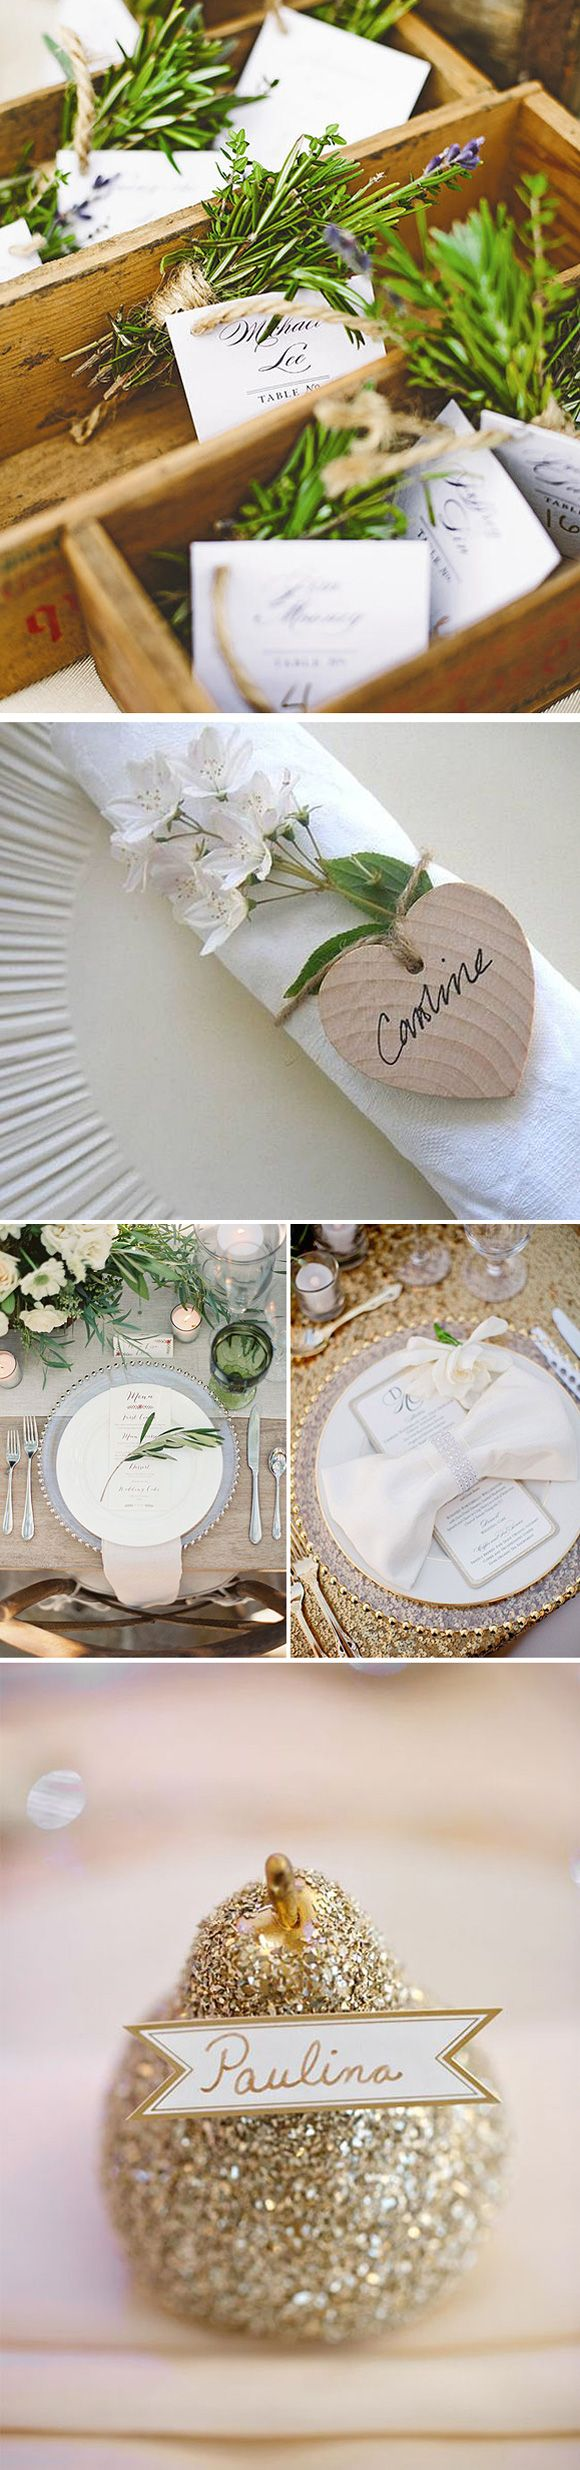 Ideas decoracion platos invitados boda 580 2470 - Detalles decoracion boda ...